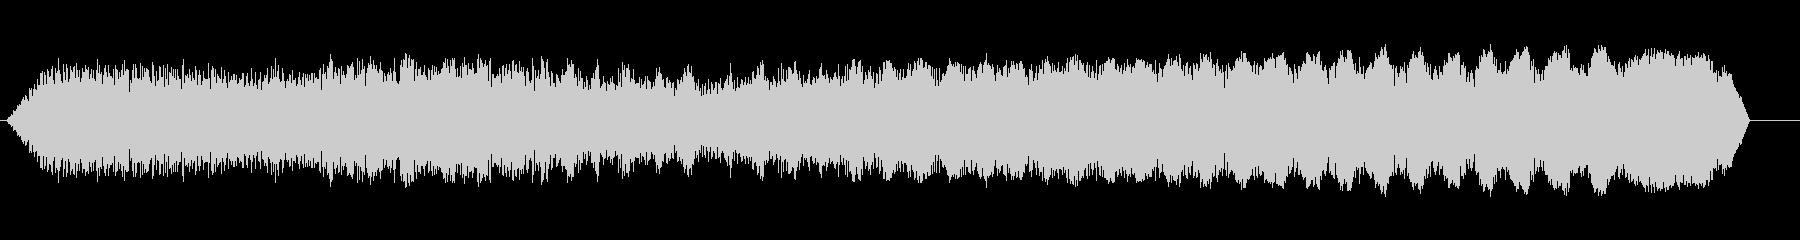 GTSカー; Idle / Rev...の未再生の波形